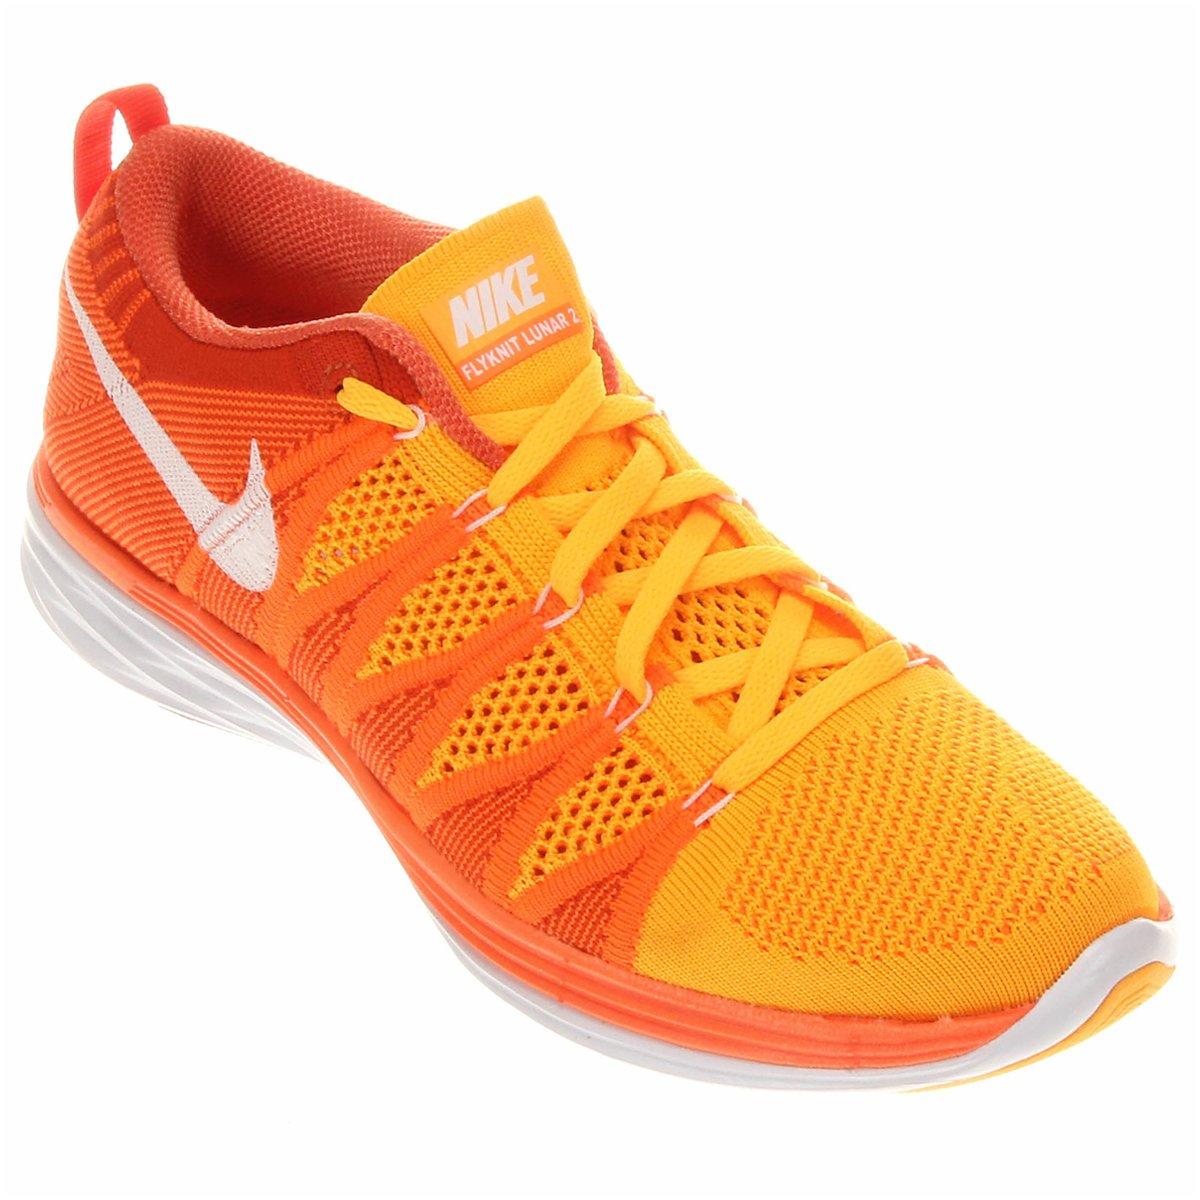 fe166c8c877 Tênis Nike Flyknit Lunar 2 - Compre Agora